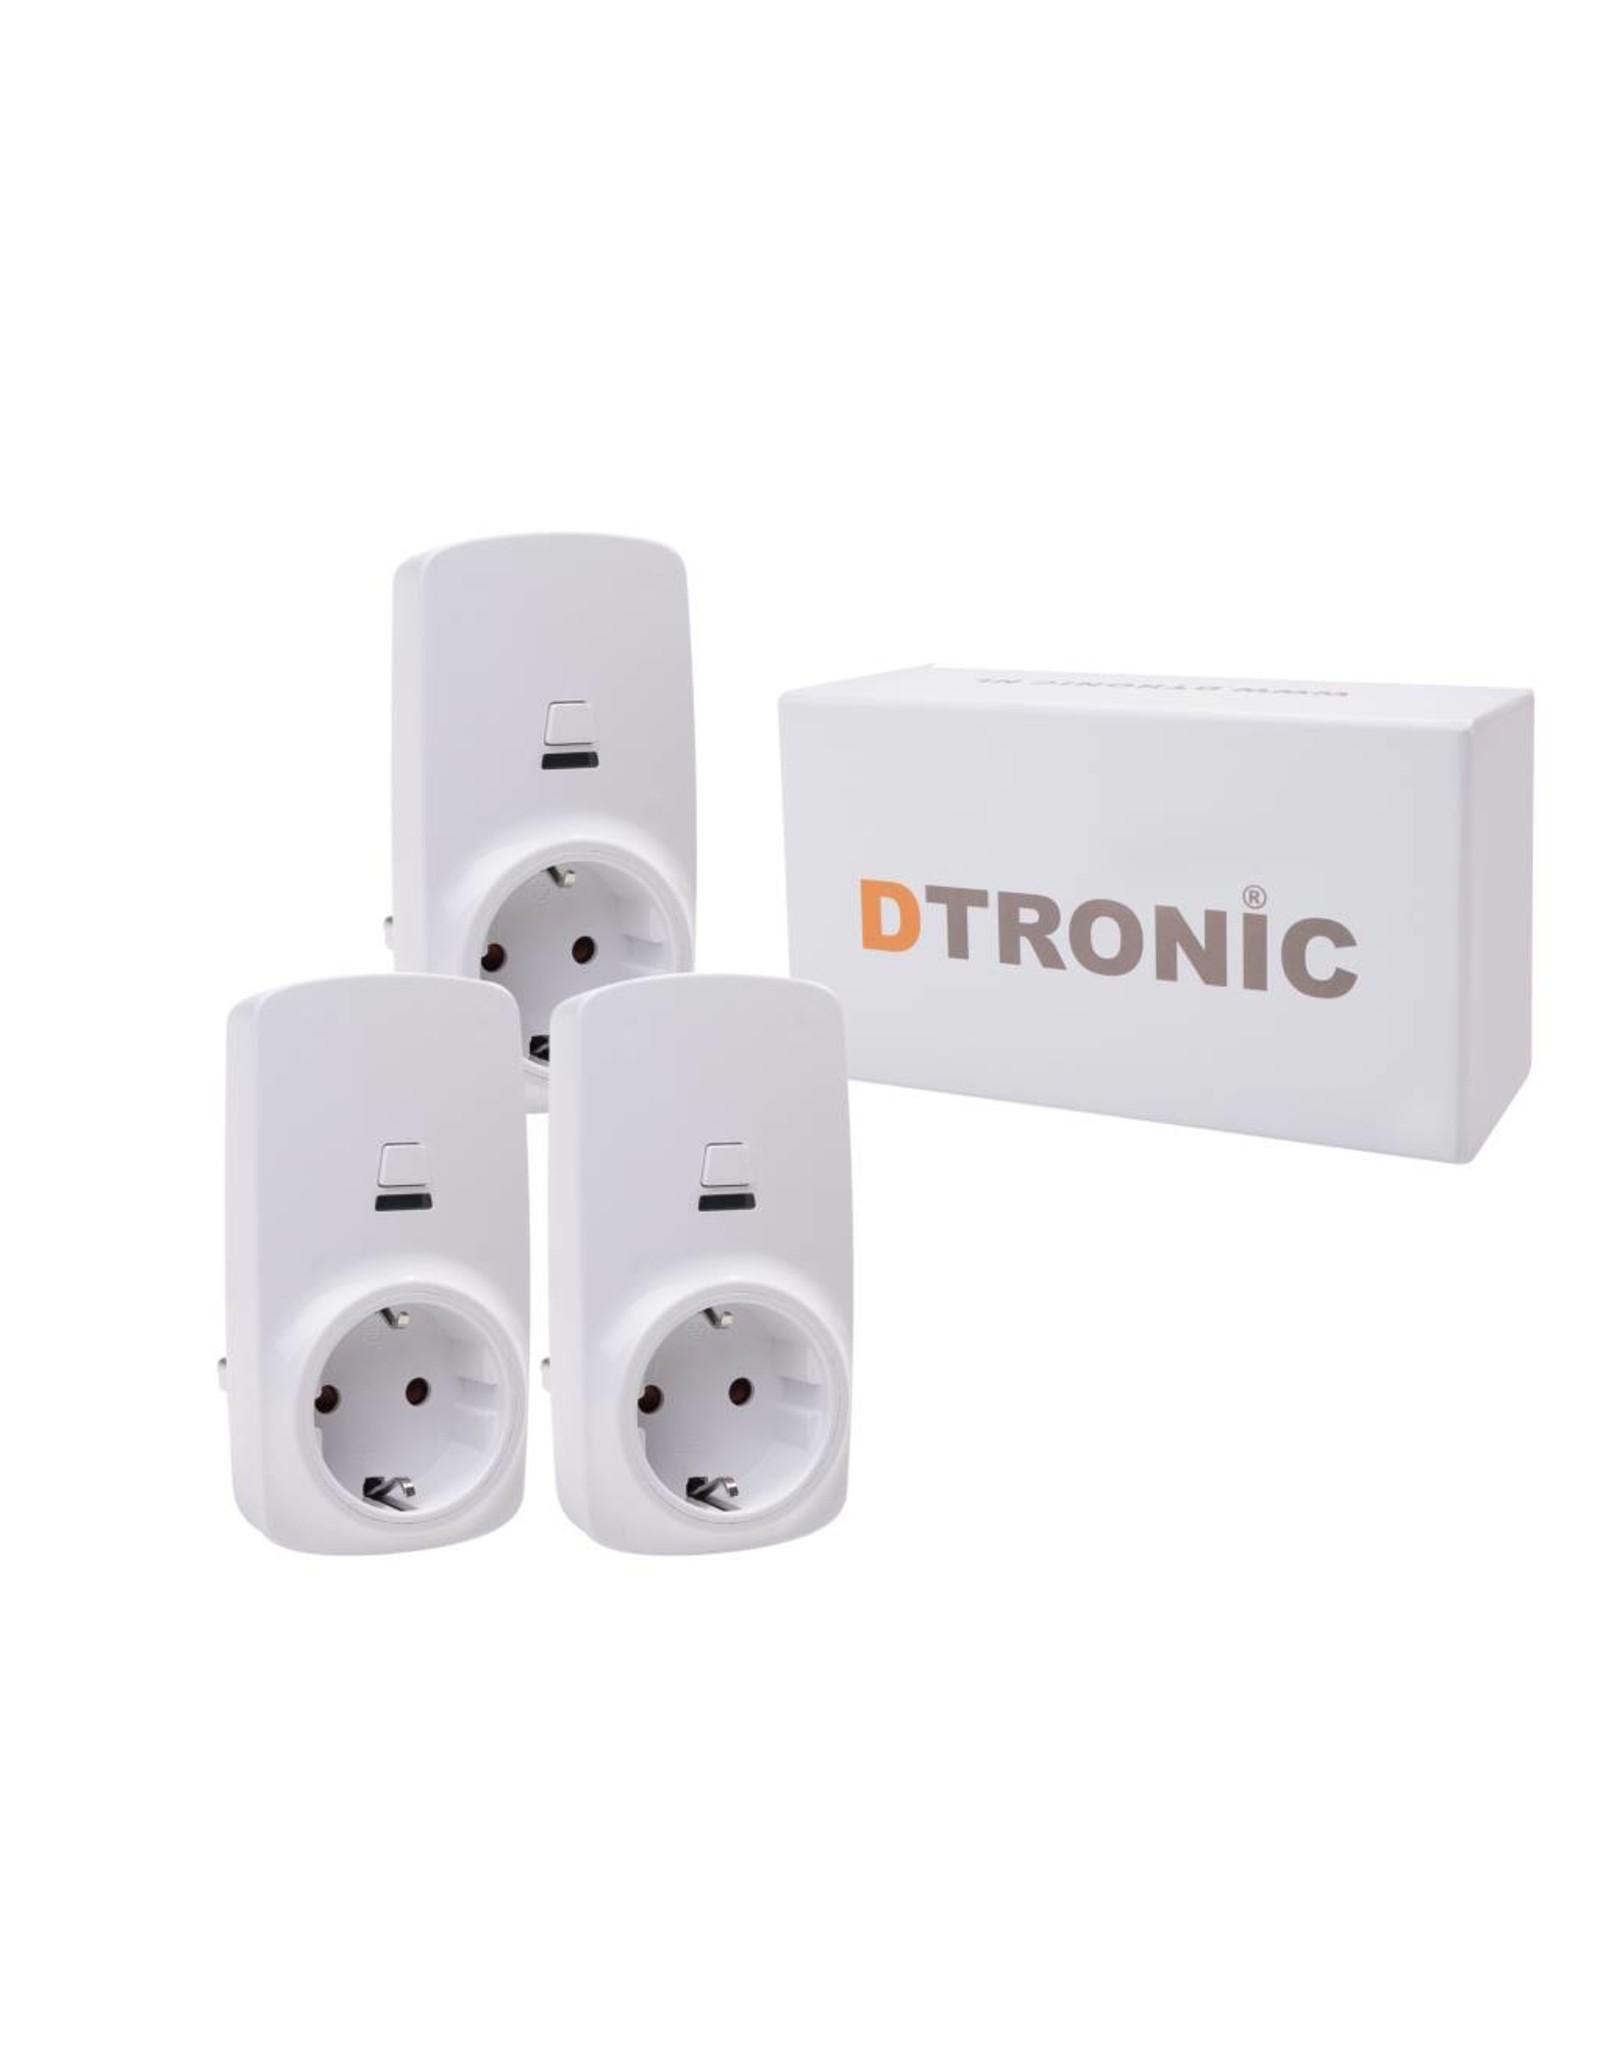 DTRONIC DTRONIC - WLSC01 - 3st.